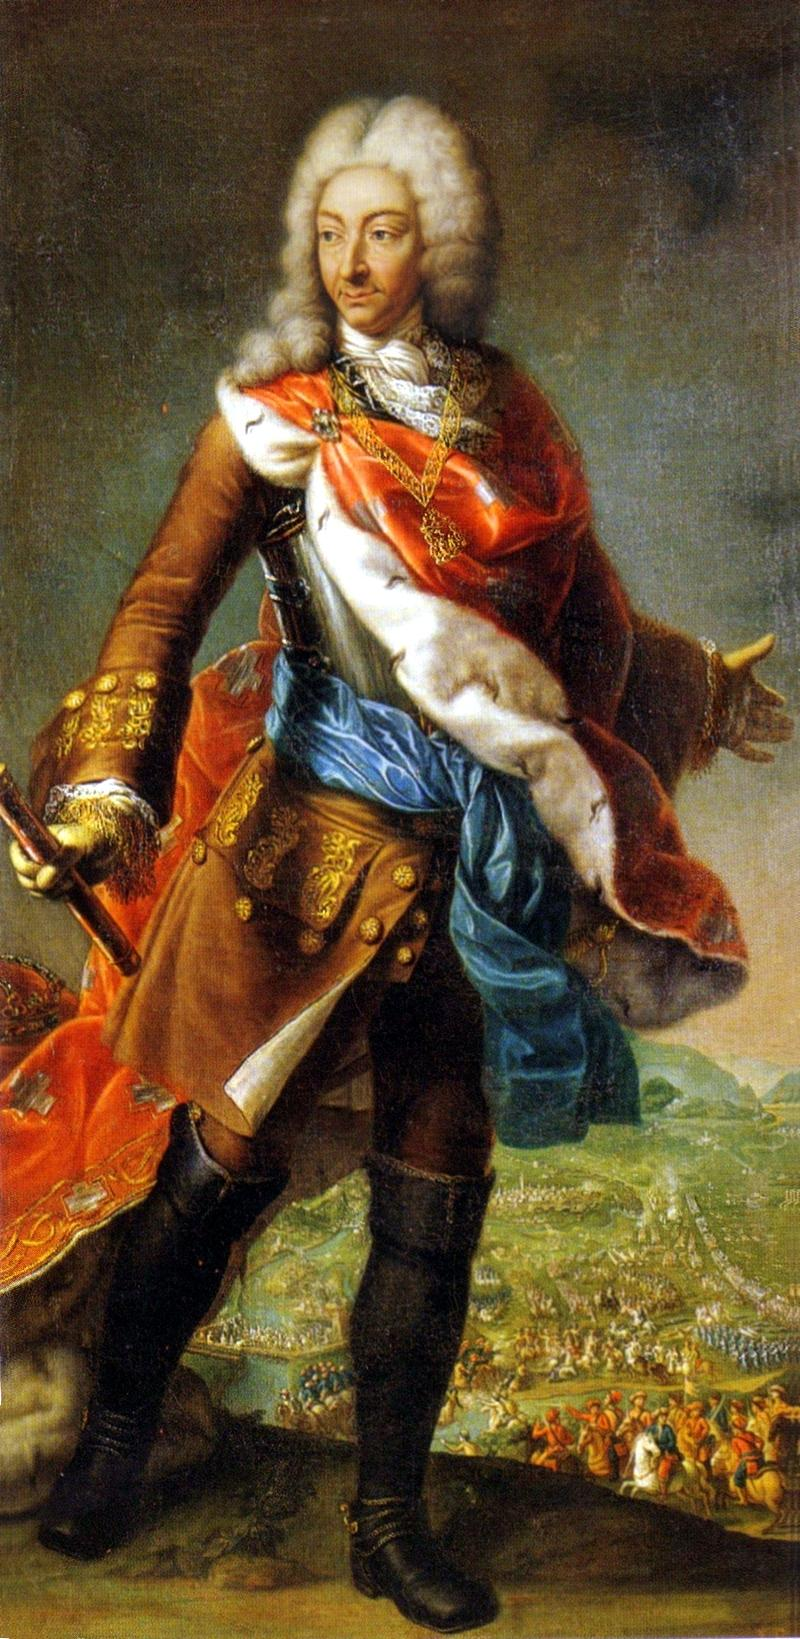 Maria_Giovanna_Battista_Clementi,_La_Clementina,_Portrait_of_Victor_Amadeus_II_of_Savoy,_during_the_siege_of_Turin_(1706),_Reggia_di_Venar